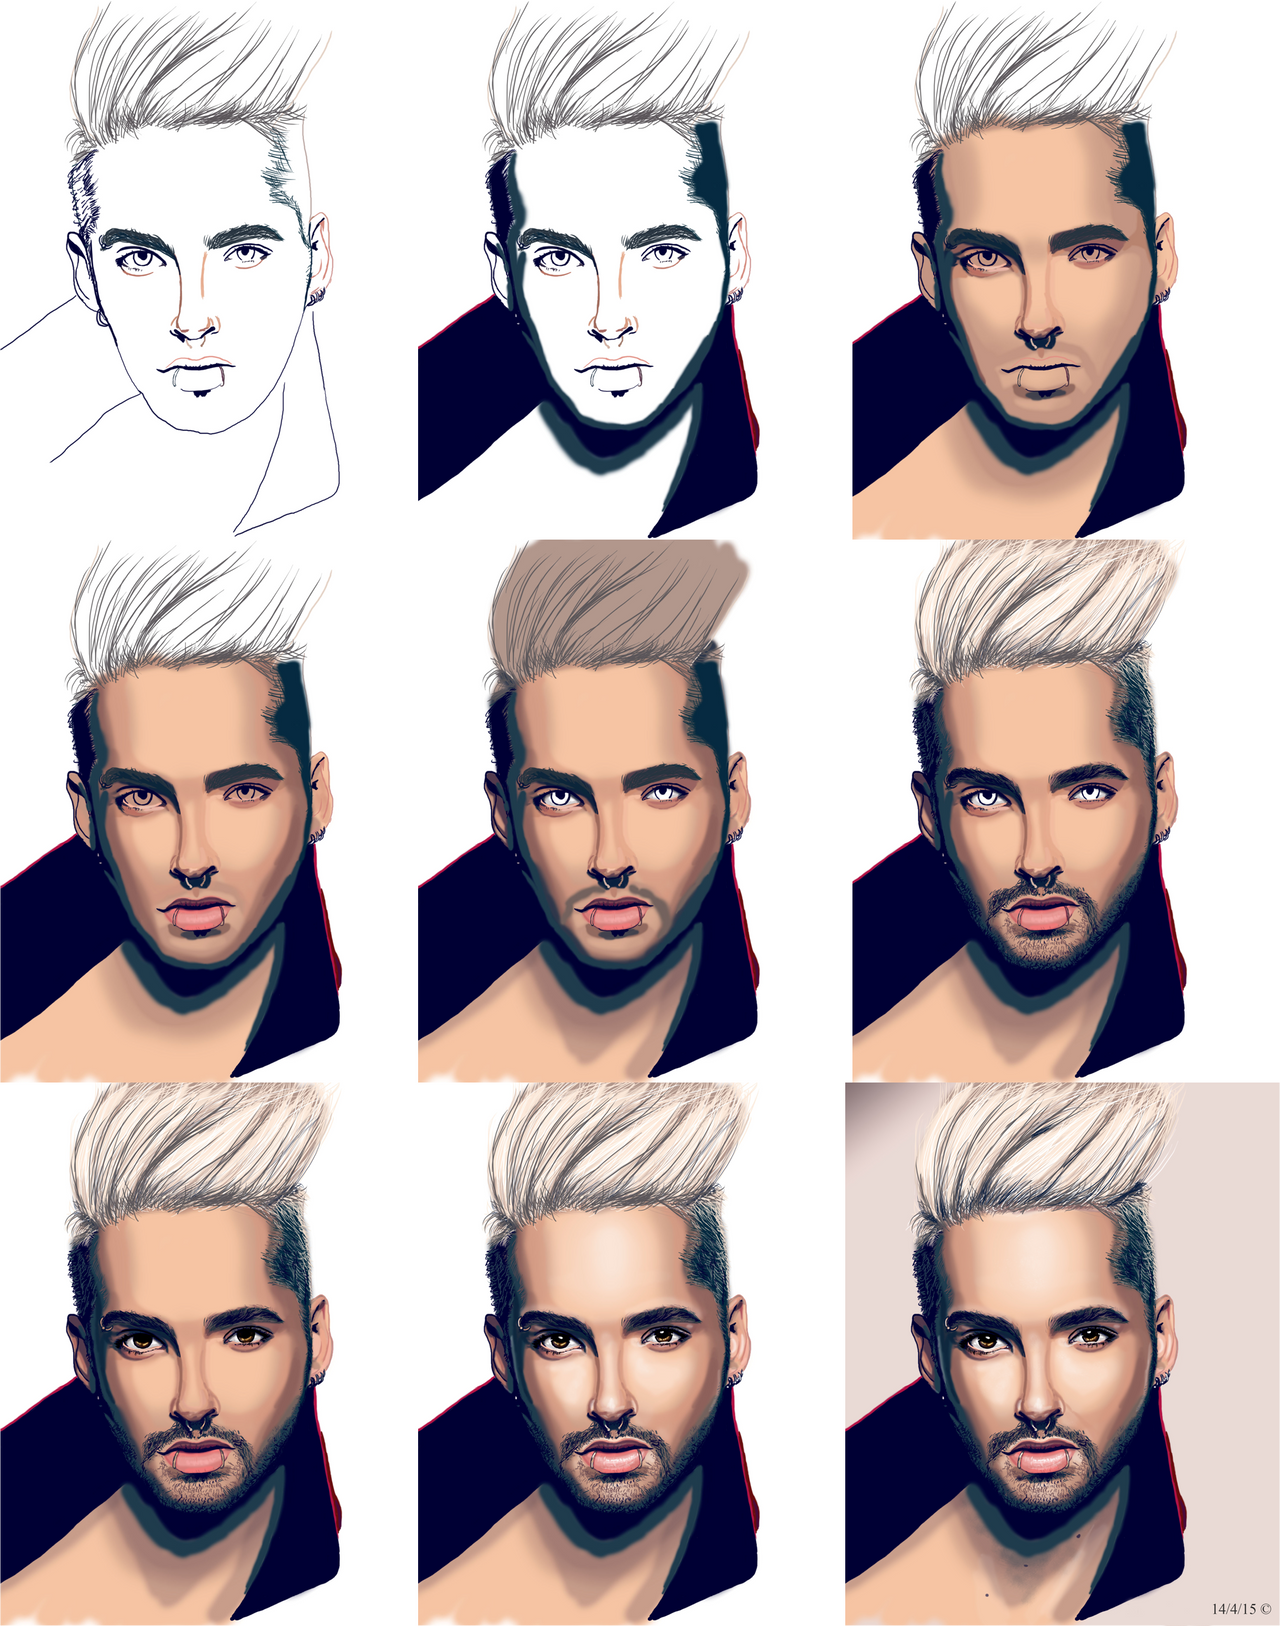 Bill Kaulitz Screenshots by Chrystall-Bawll